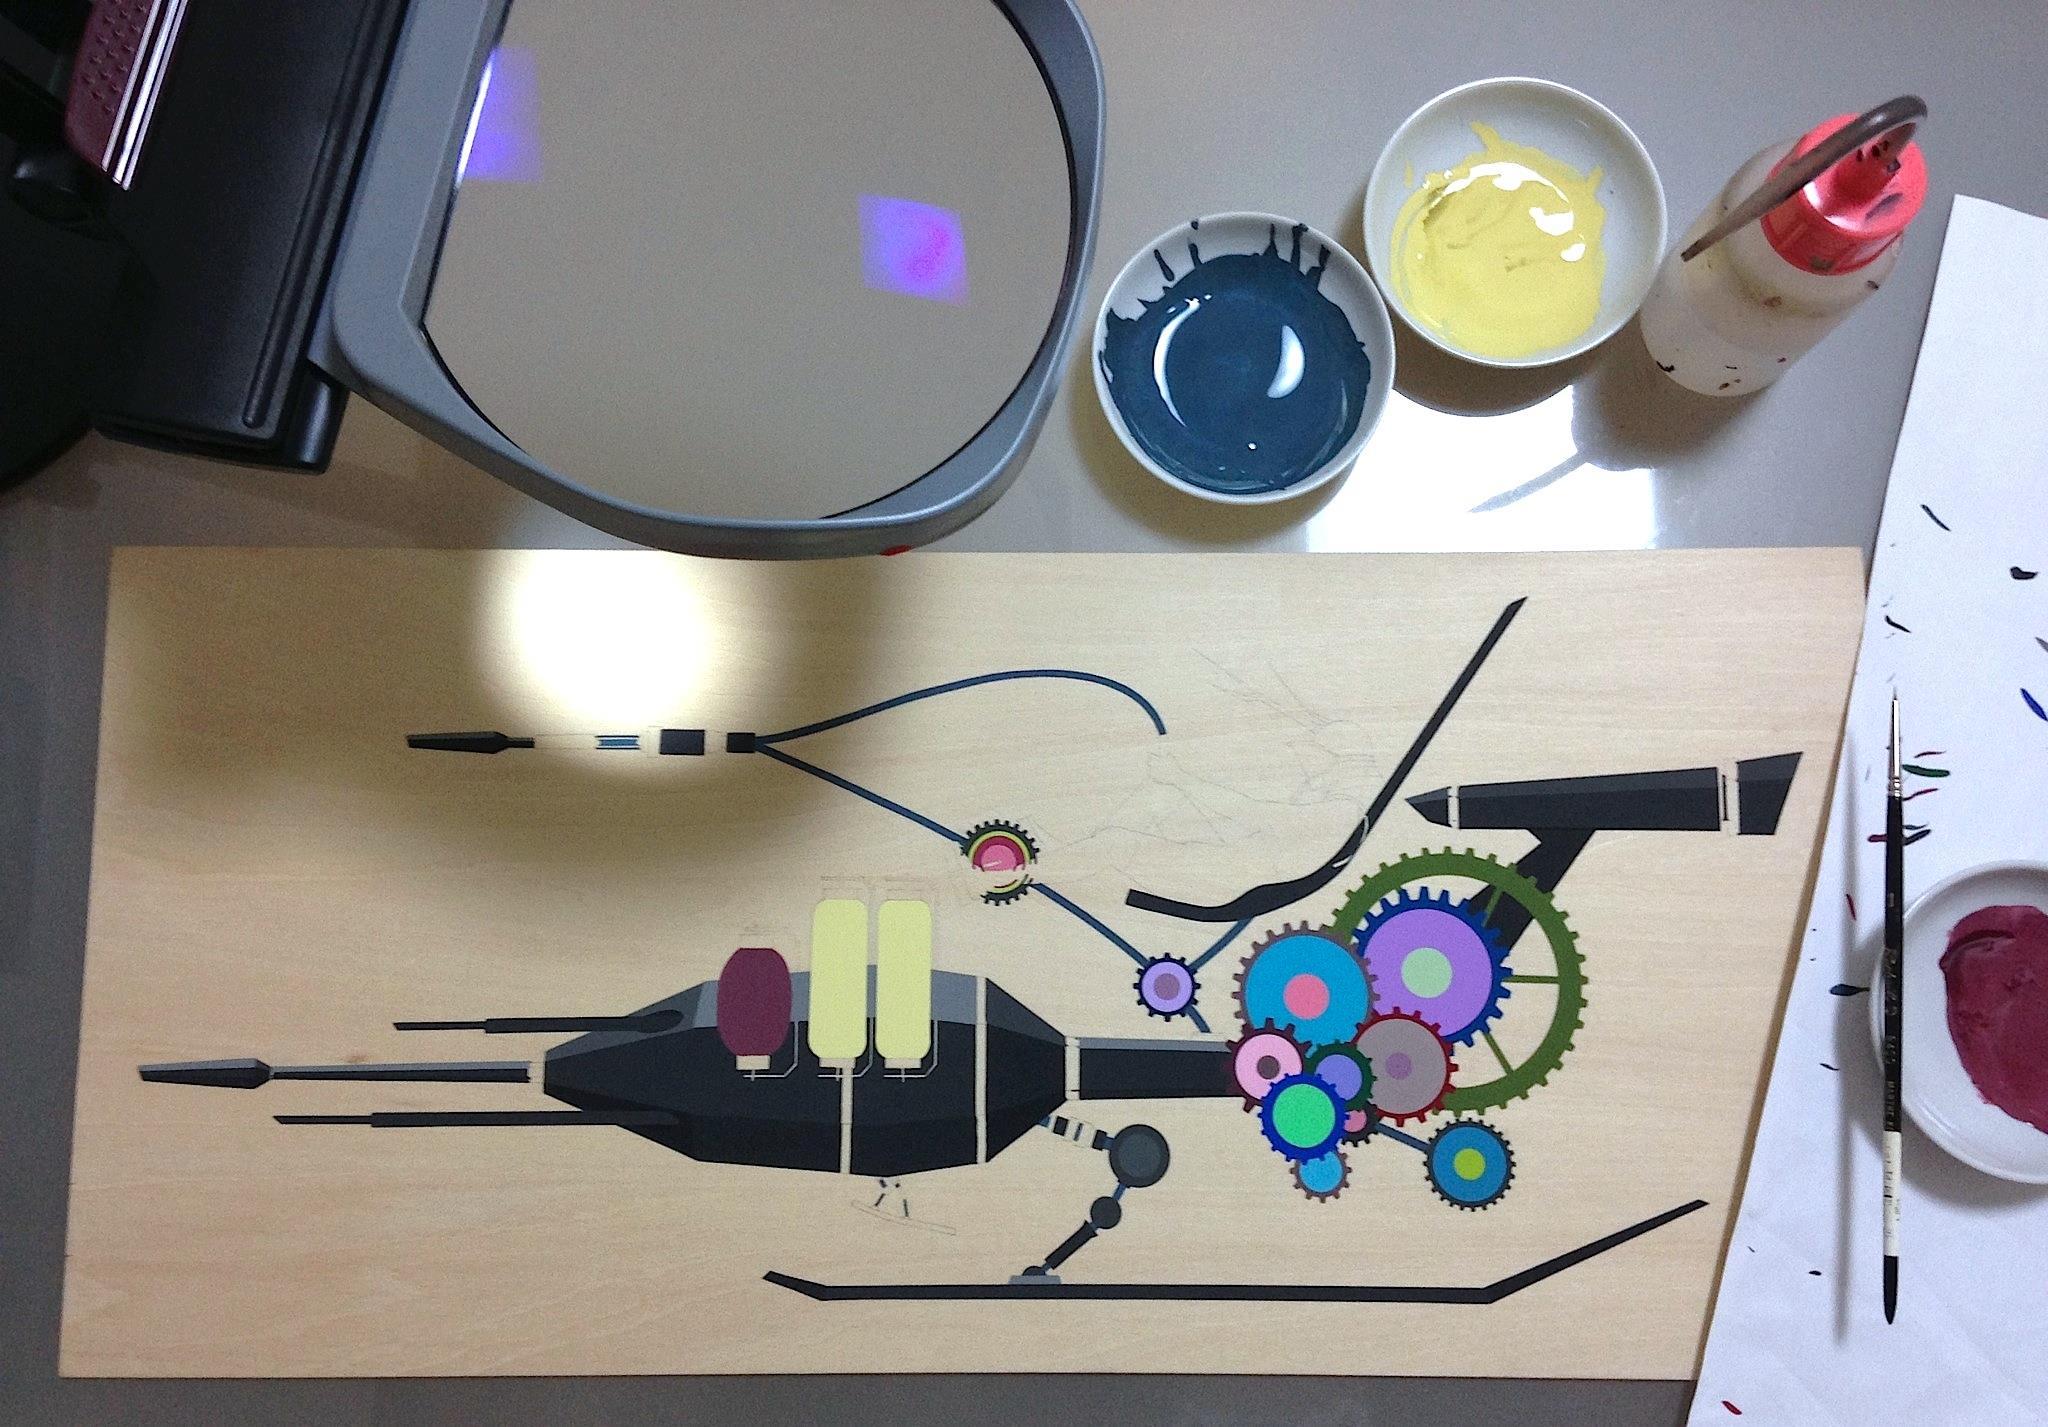 tenmyouya hisashi japanese painting 6-2